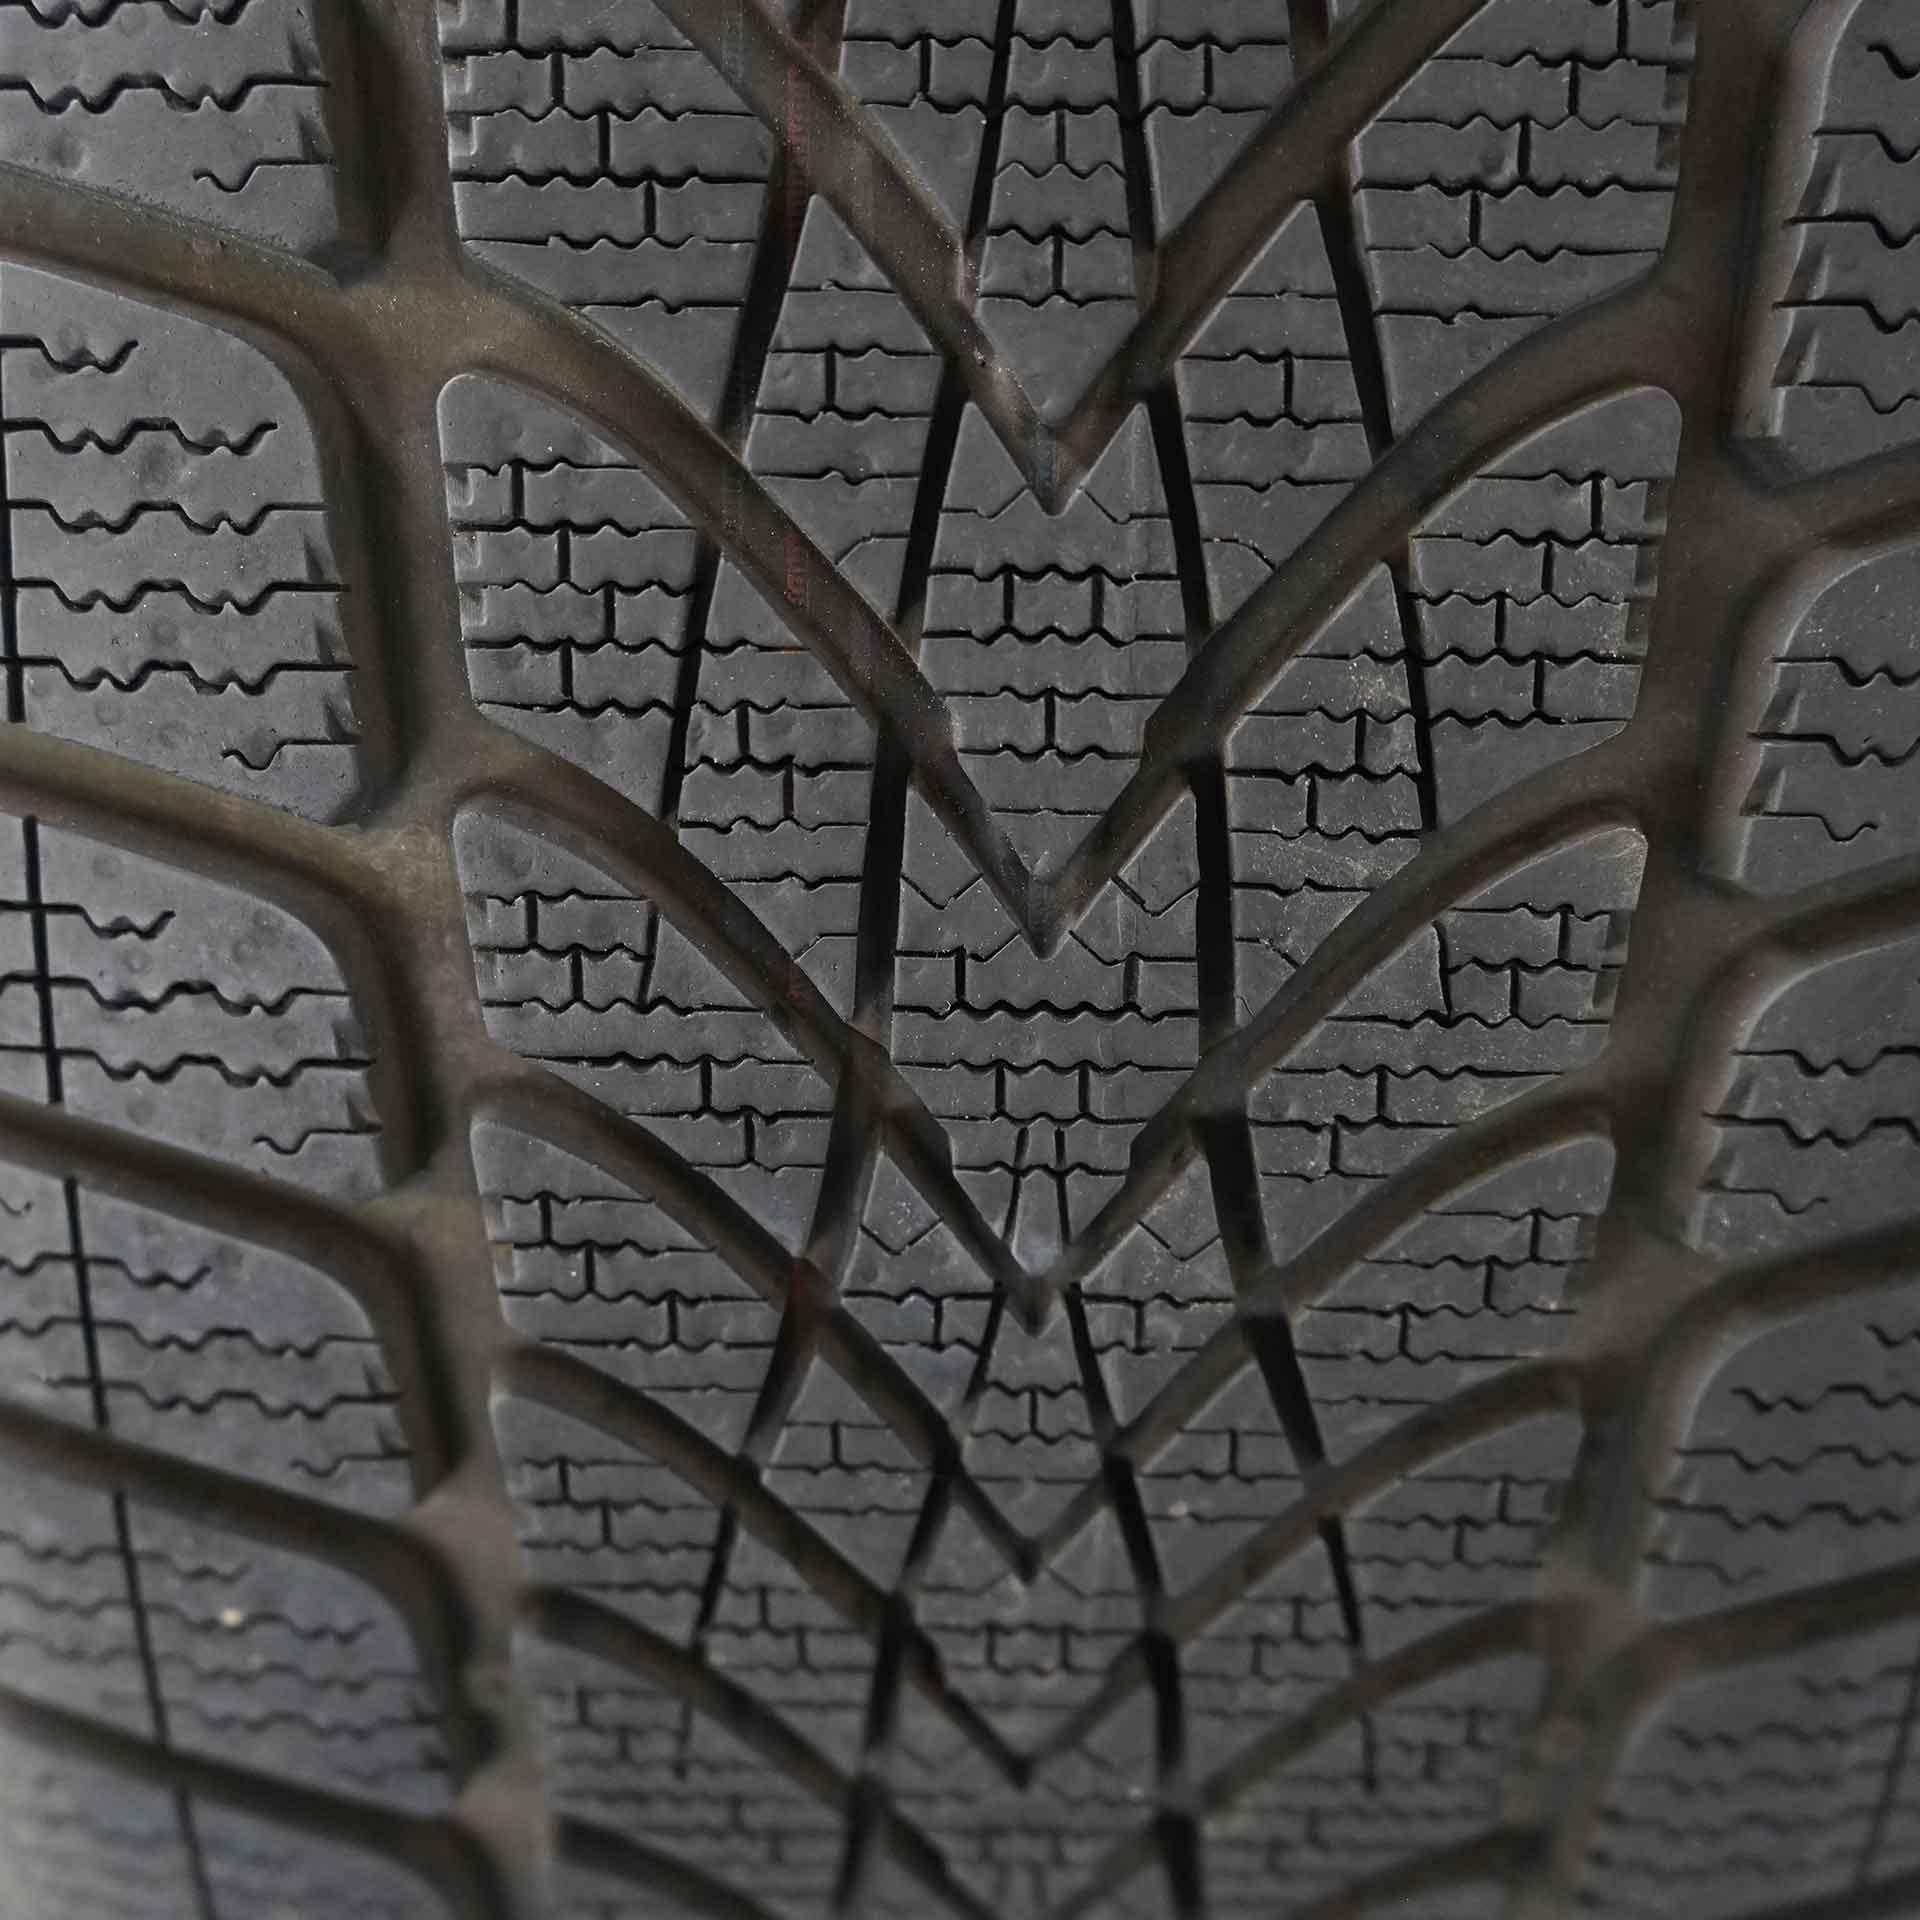 S-Klasse (222) Gebrauchter 18 Zoll Original Mercedes-Benz Winterkomplettrad-Satz Dunlop